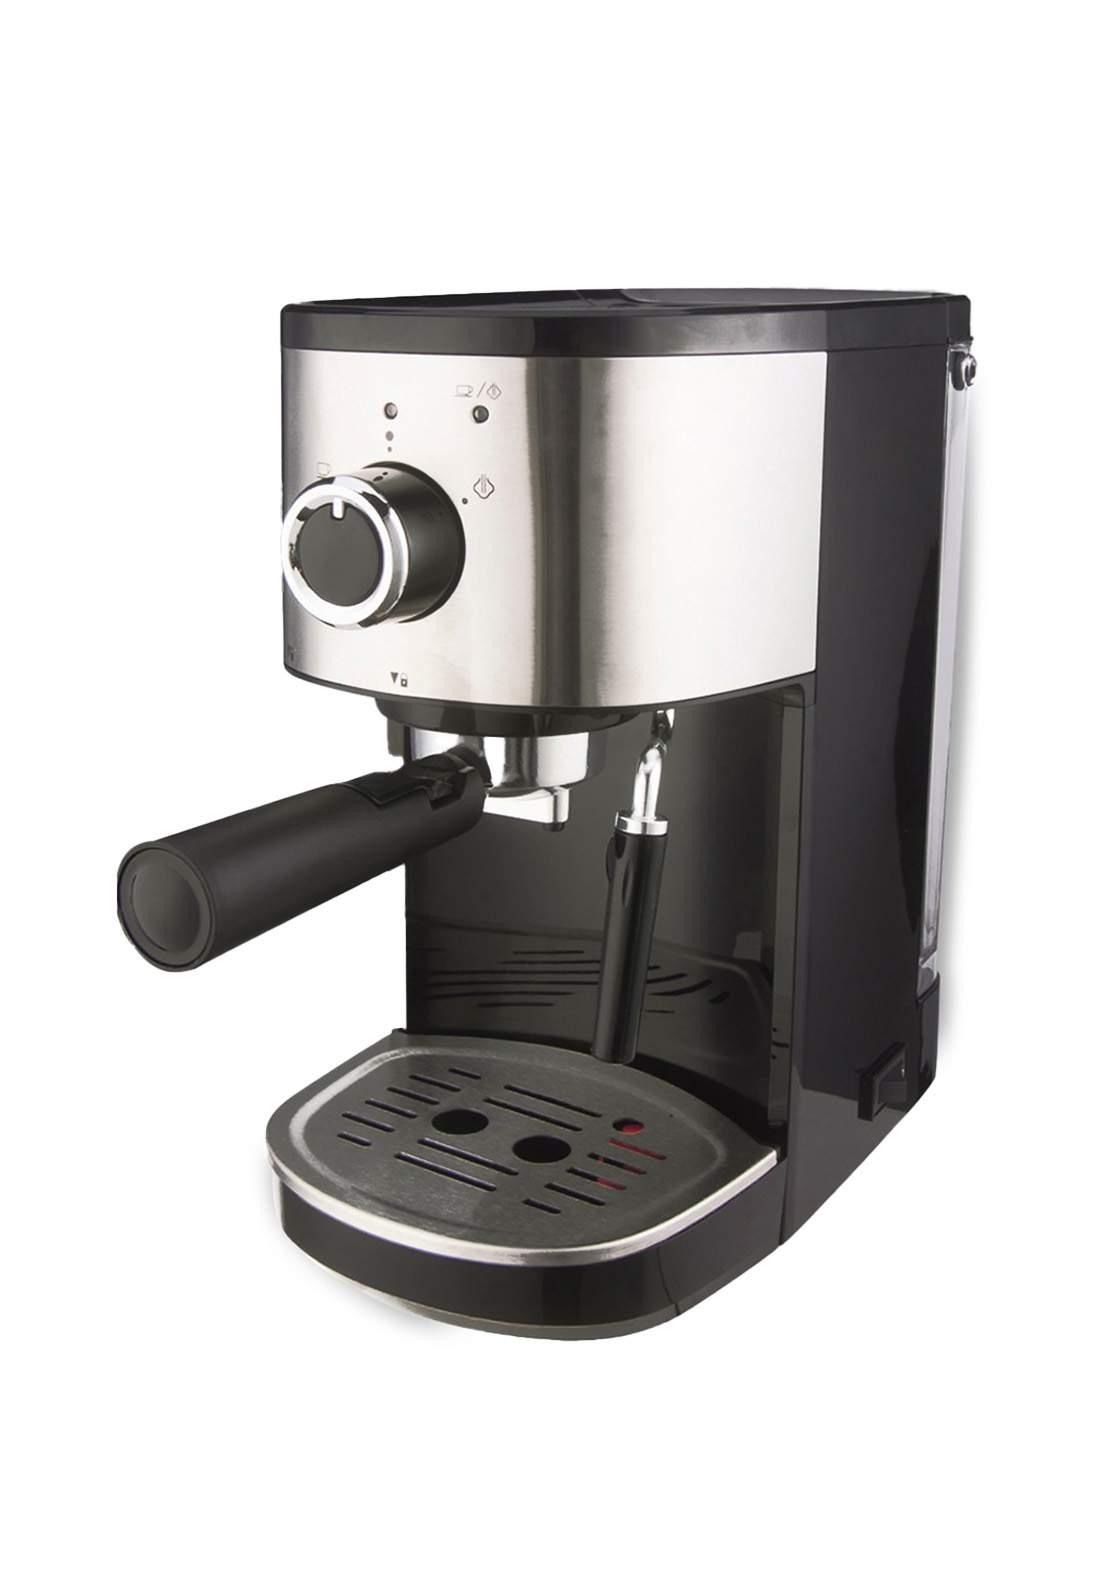 Delmonti DL 645 N Coffee Maker ماكنة صنع قهوة